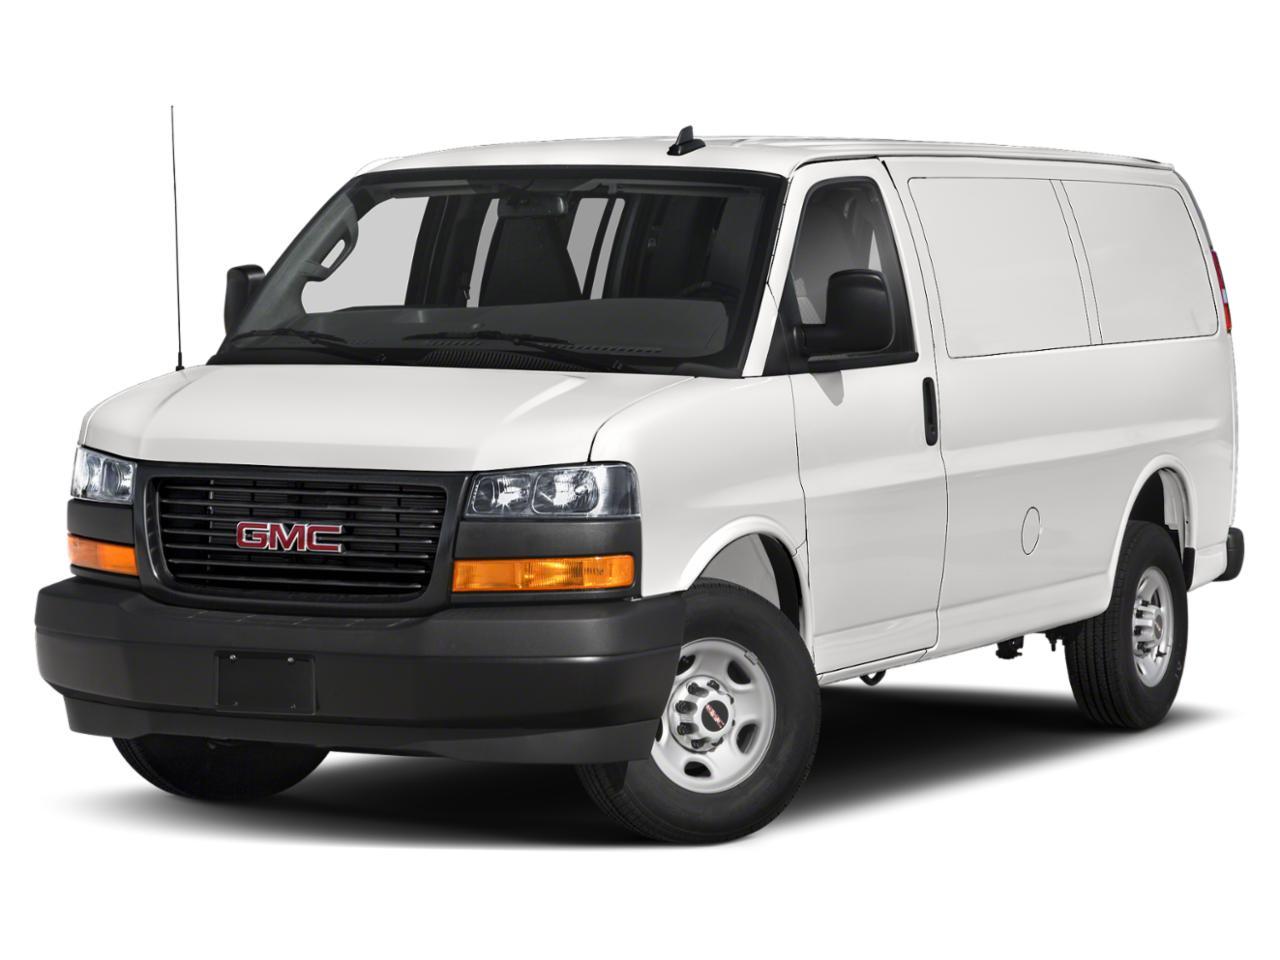 2021 GMC Savana Cargo Van Vehicle Photo in Davison, MI 48423